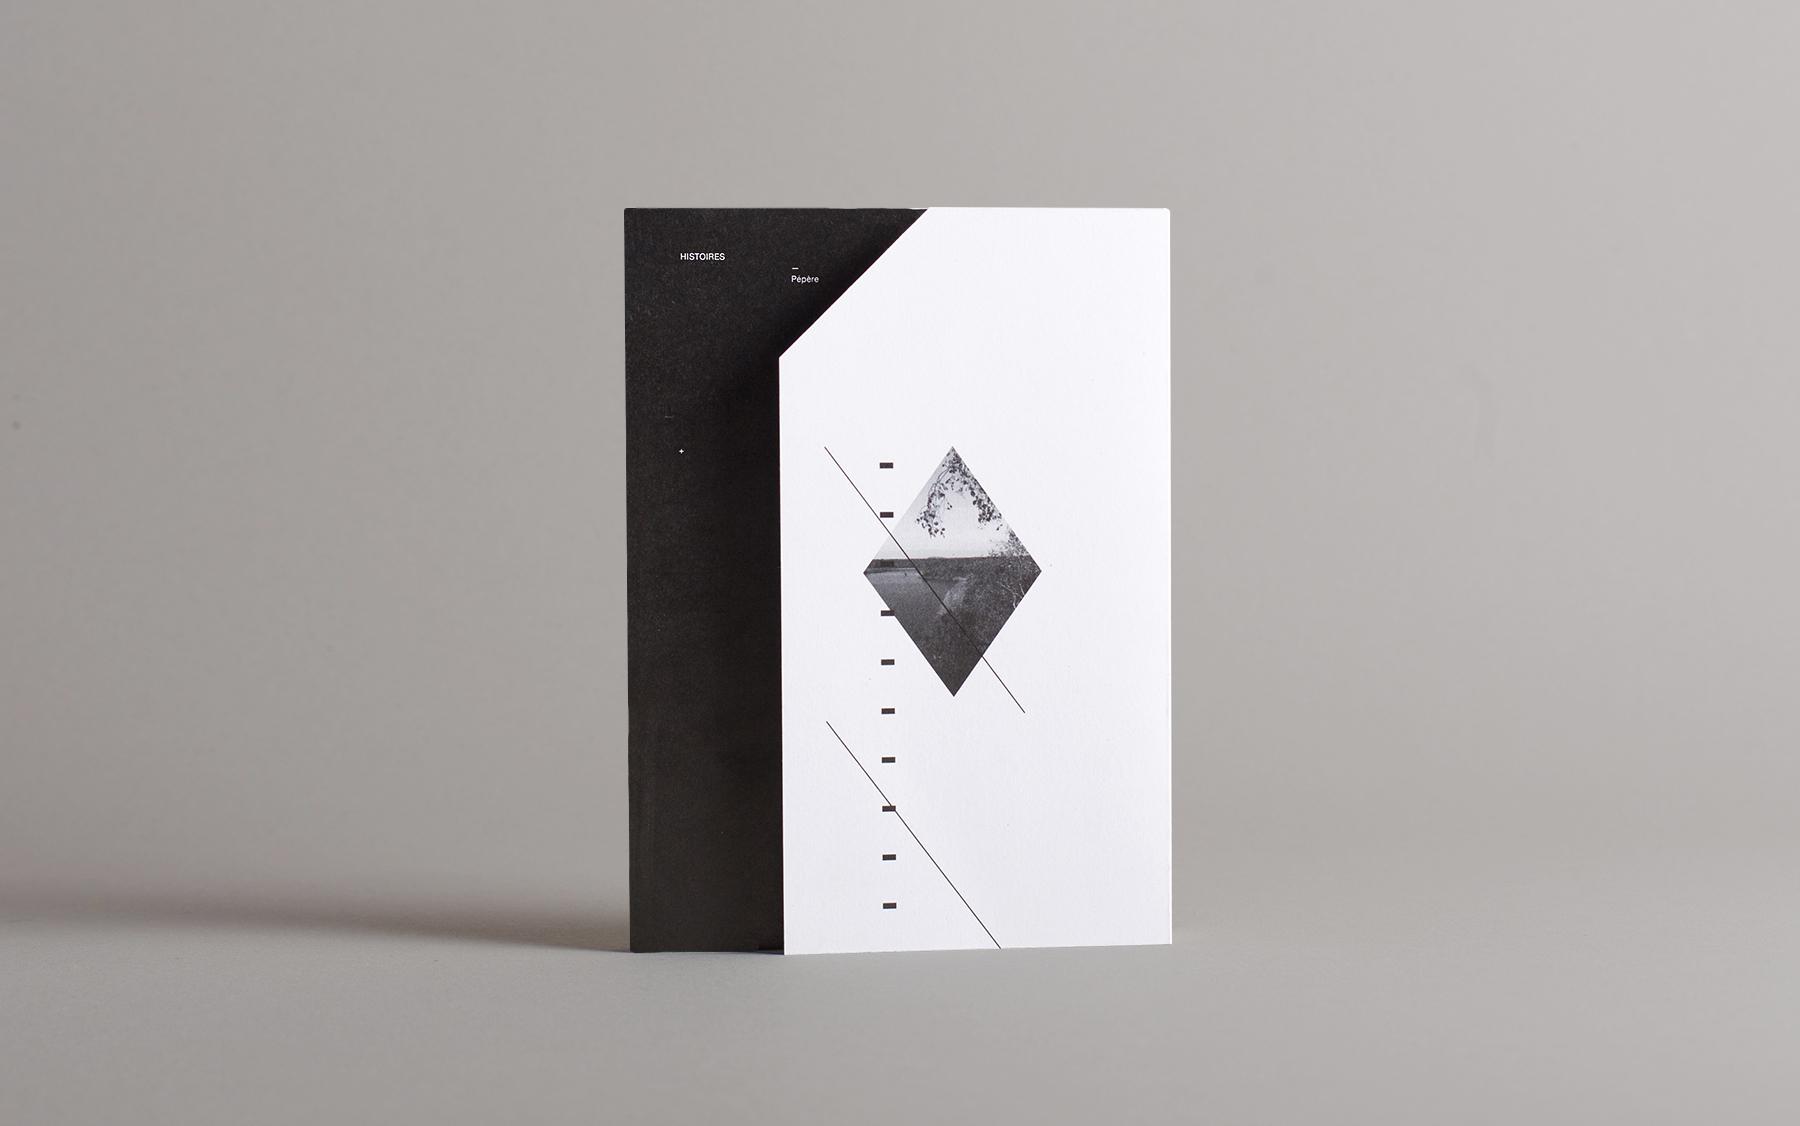 Histoires_MOXS_design_001